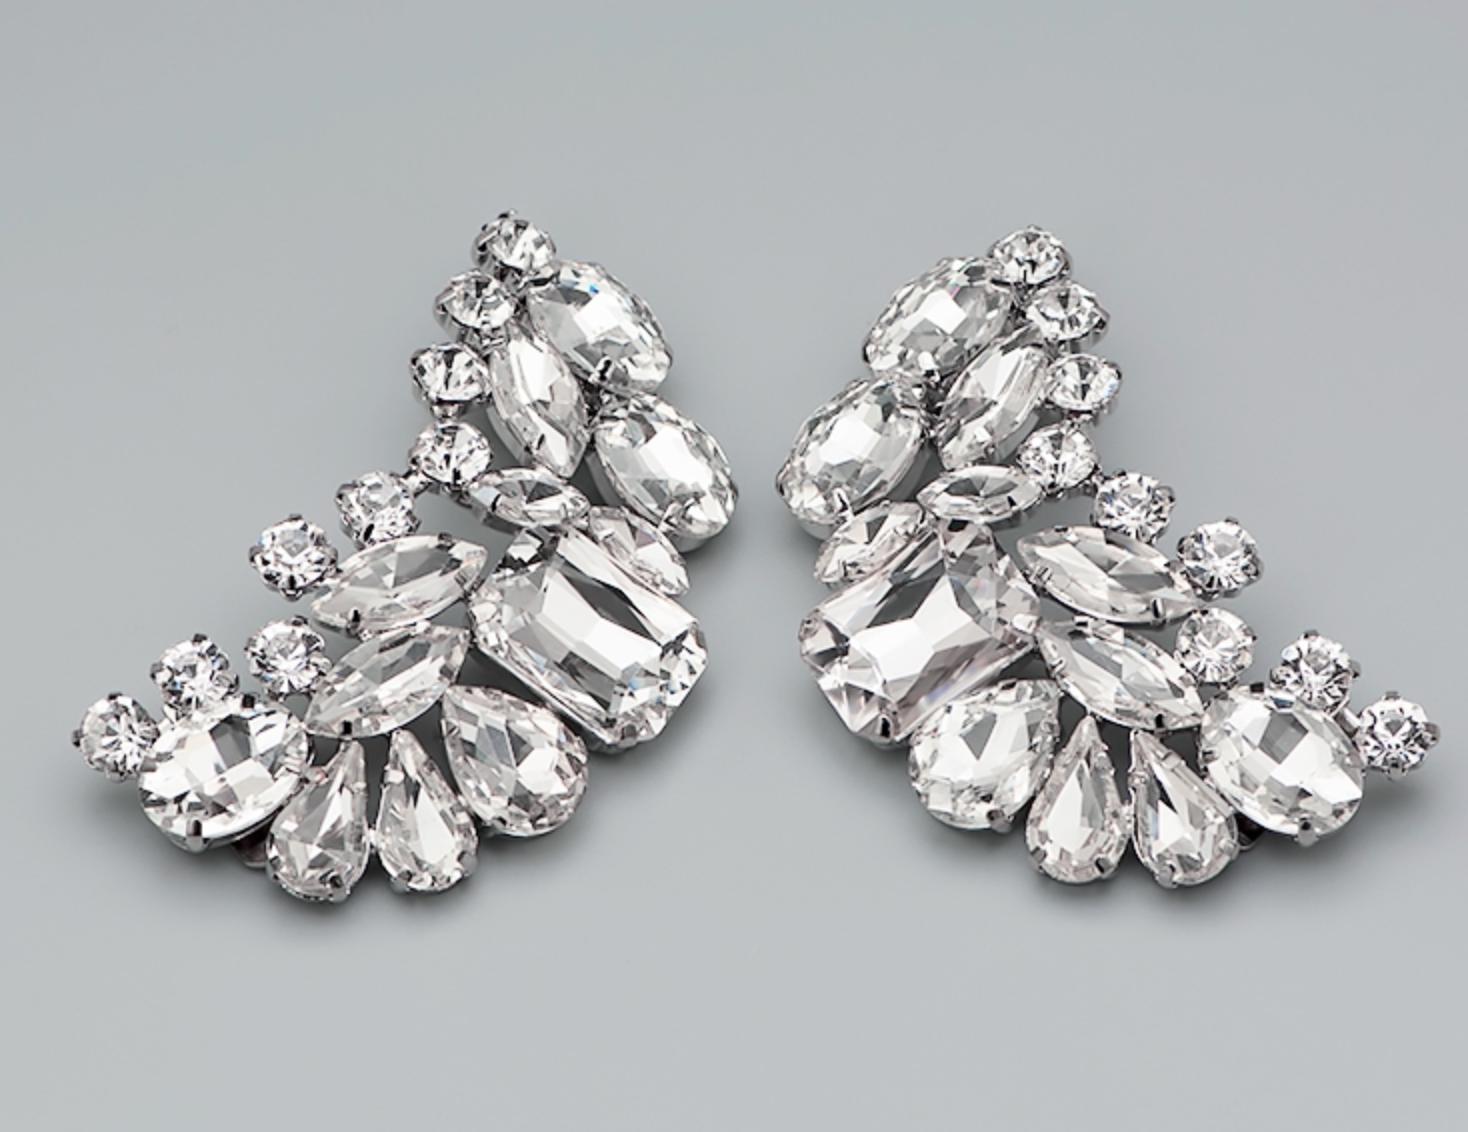 2 Pcs Rhinestone Crystal Diamante Crystal Wedding Shoes Shoe Clips Charms